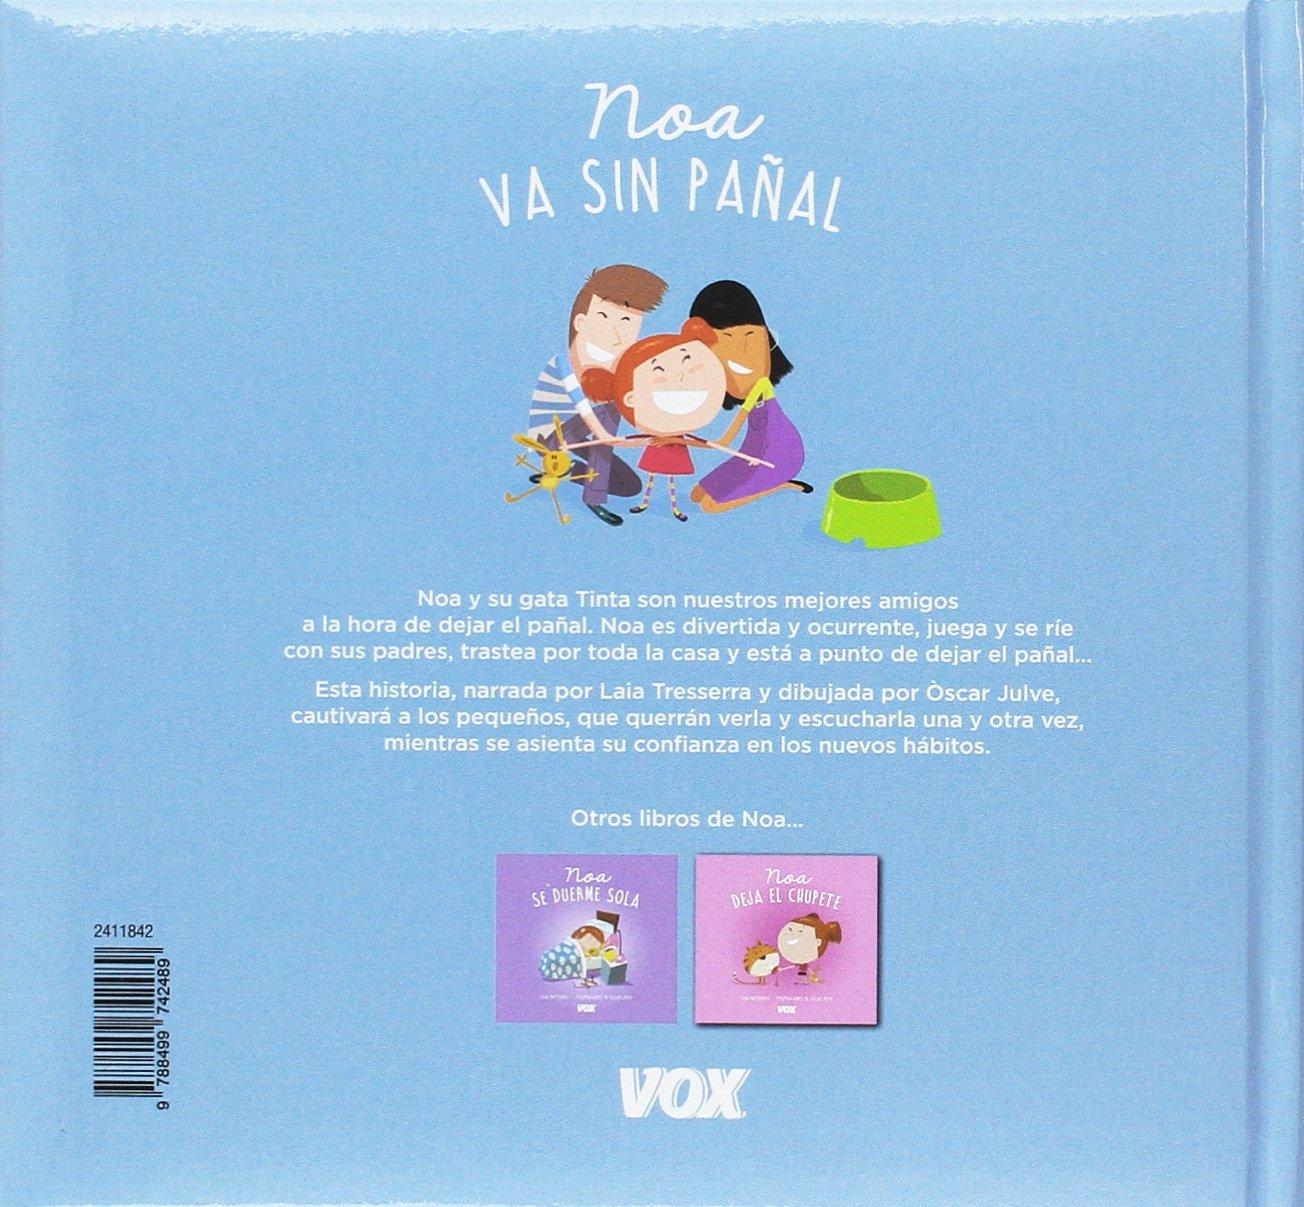 Noa va sin pañal Vox - Infantil / Juvenil - Castellano - A Partir De 3 Años - Libros De Hábitos: Amazon.es: Larousse Editorial, Òscar Julve Gil: Libros